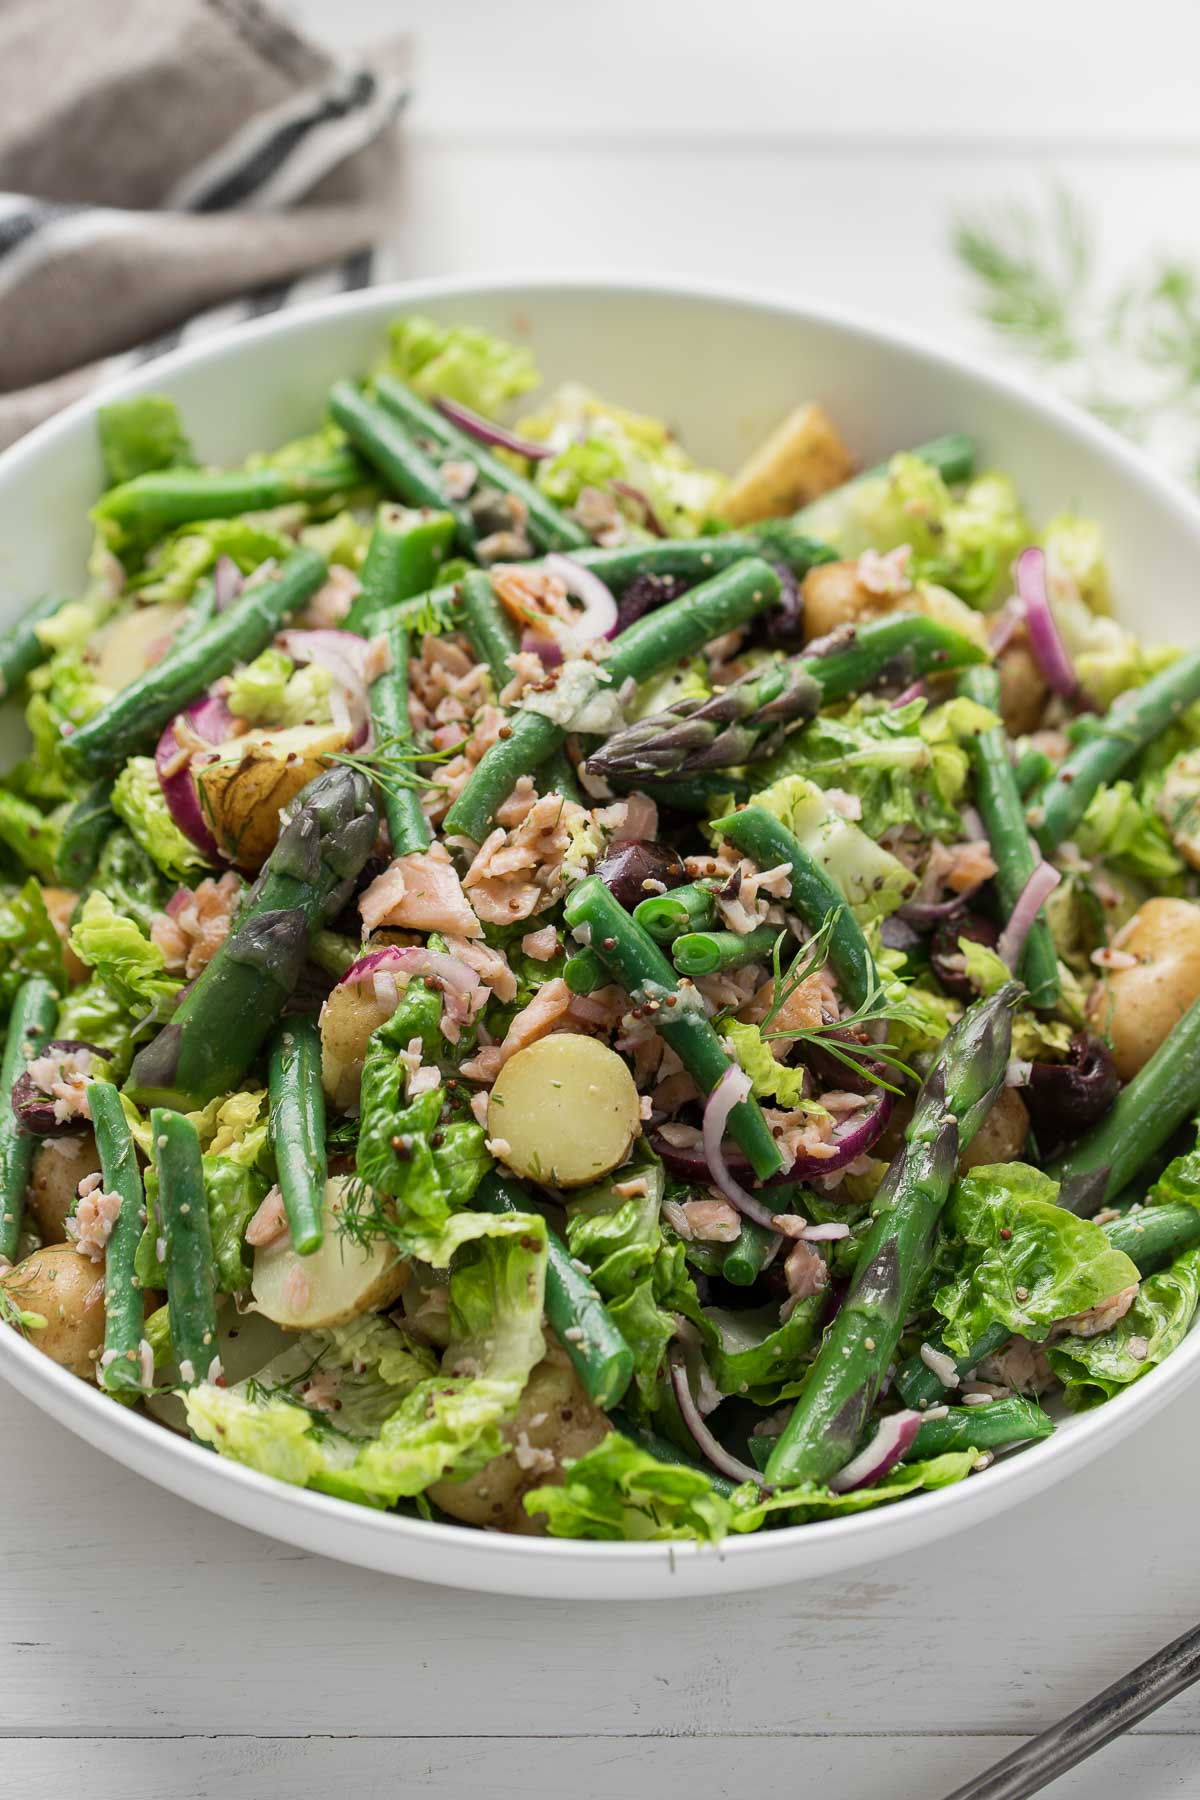 Nizza-Salat (Salade Niçoise) mit Räucherlachs